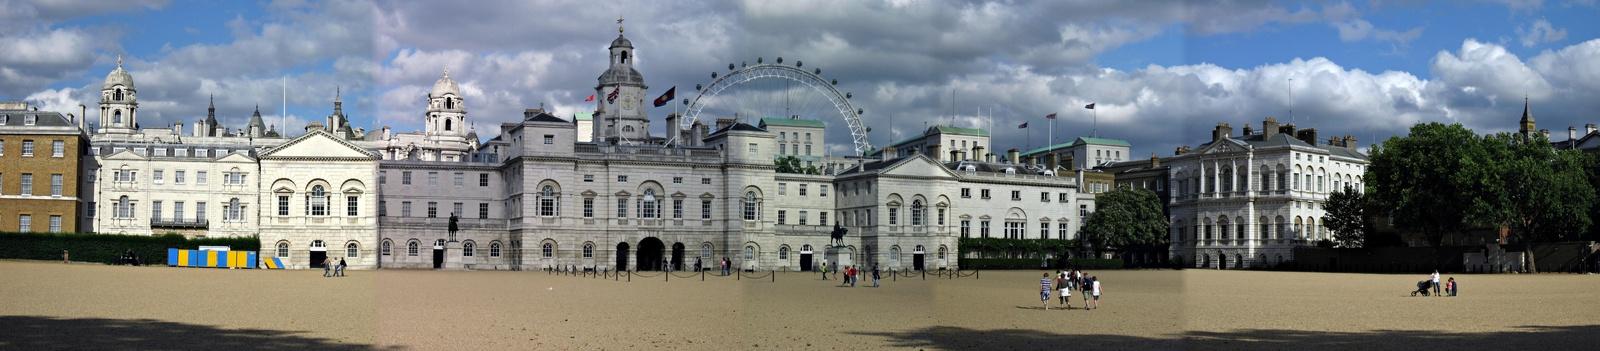 Horse Guards Parade and Millenium wheel panorama